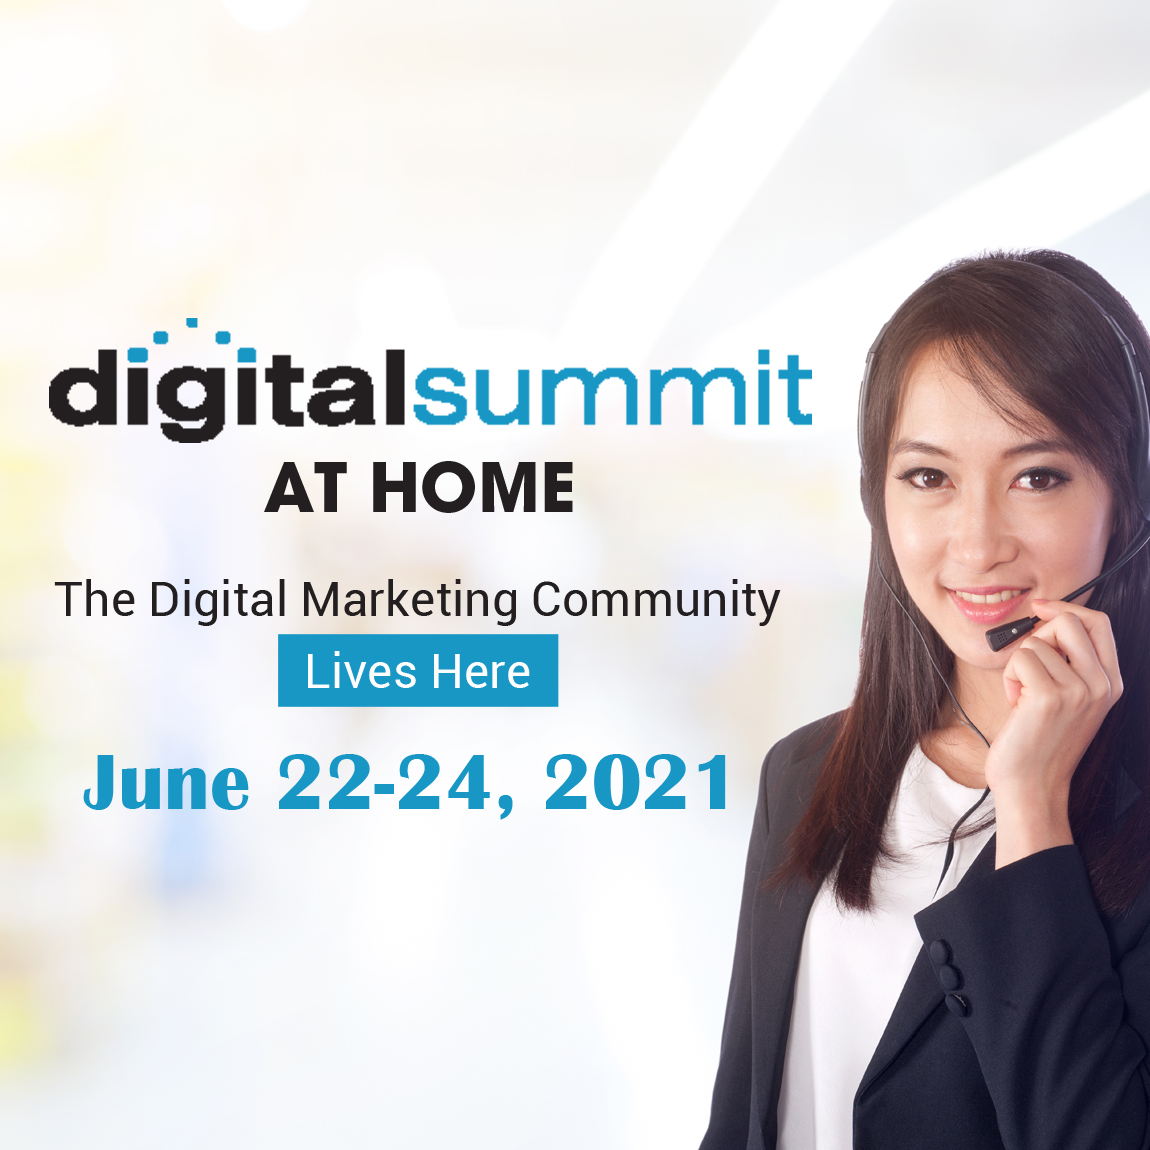 Digital Summit: At Home